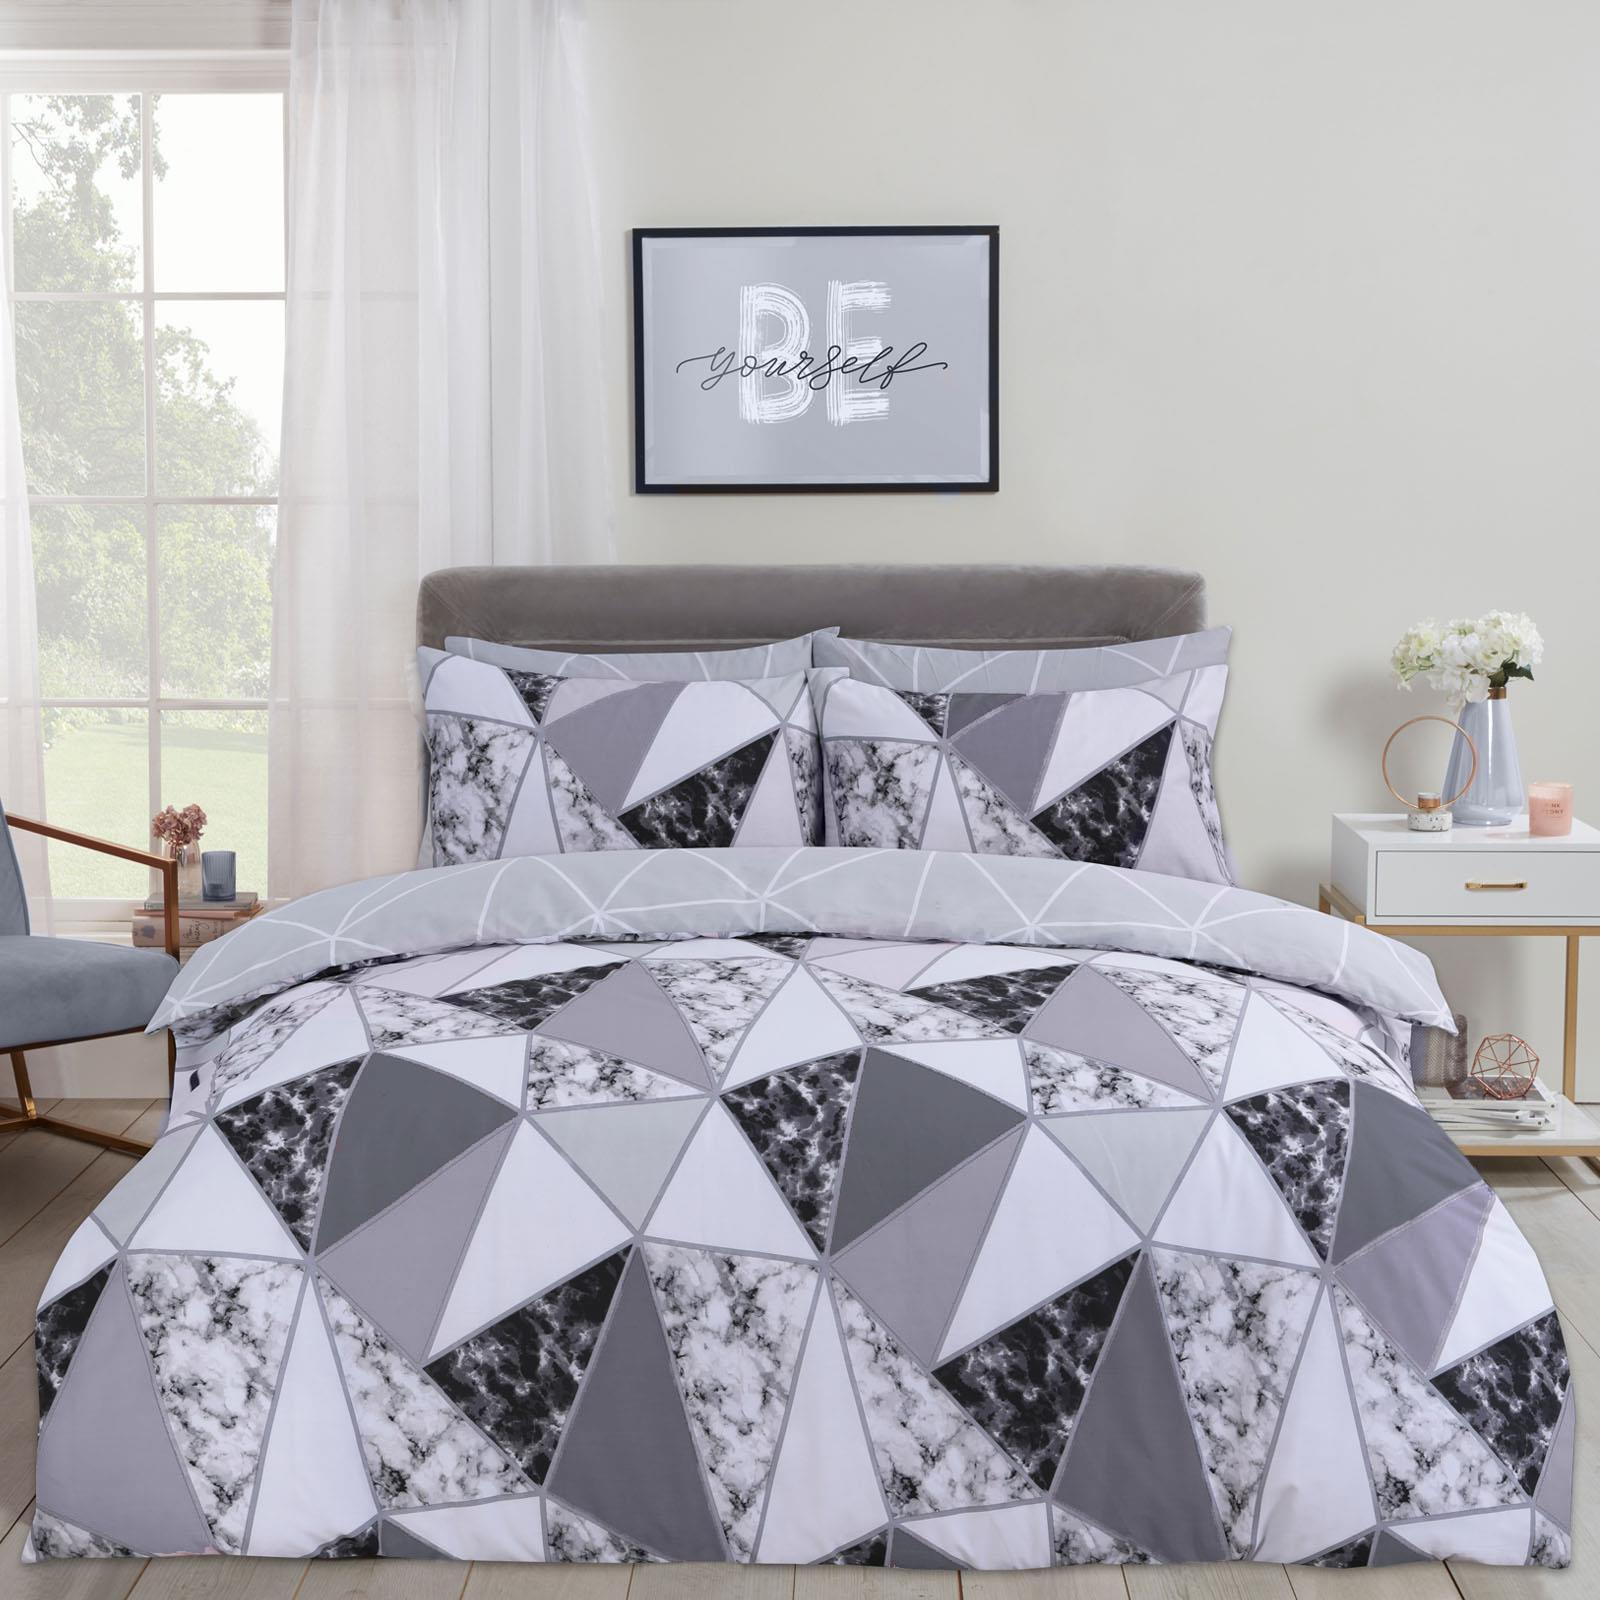 thumbnail 12 - Dreamscene Marble Geometric Duvet Cover with Pillowcase Bedding Set Grey Blush